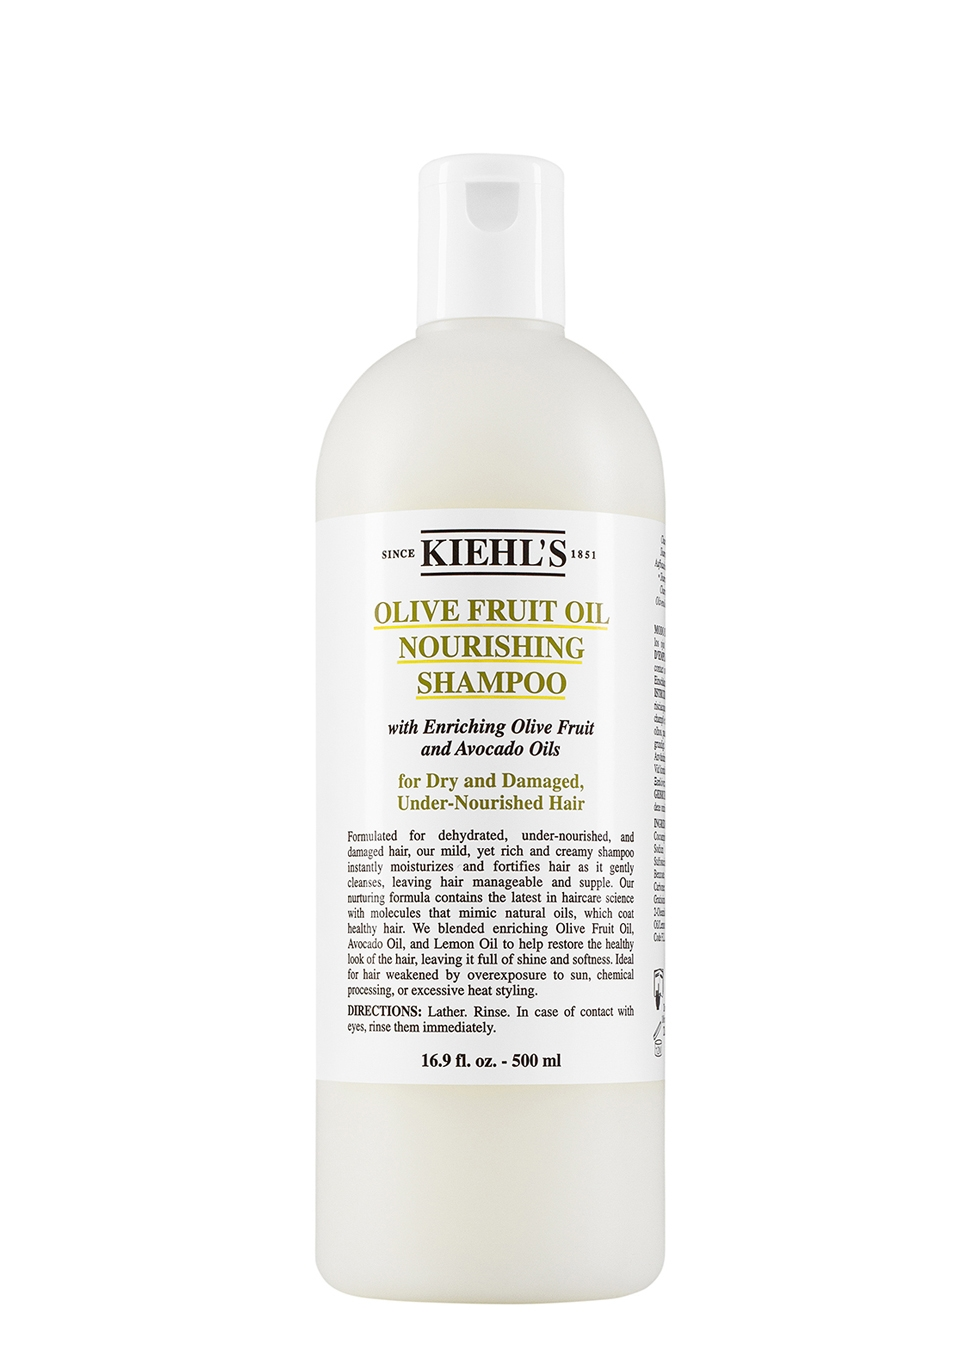 Olive Fruit Oil Nourishing Shampoo 500ml